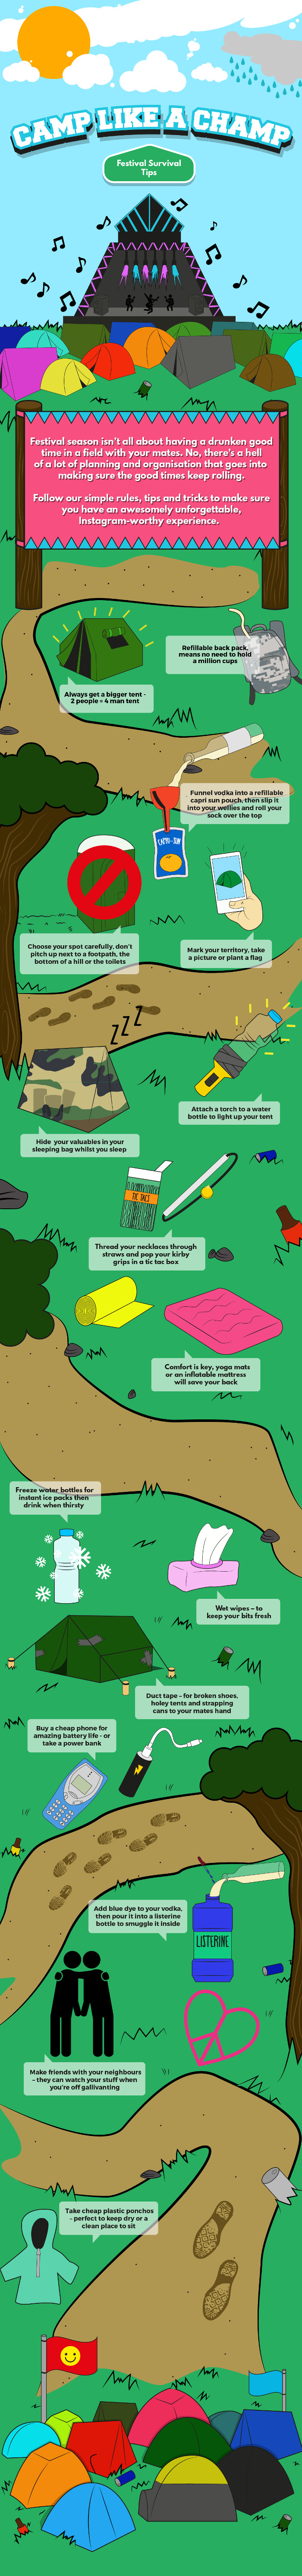 Festival Camping Survival Tips